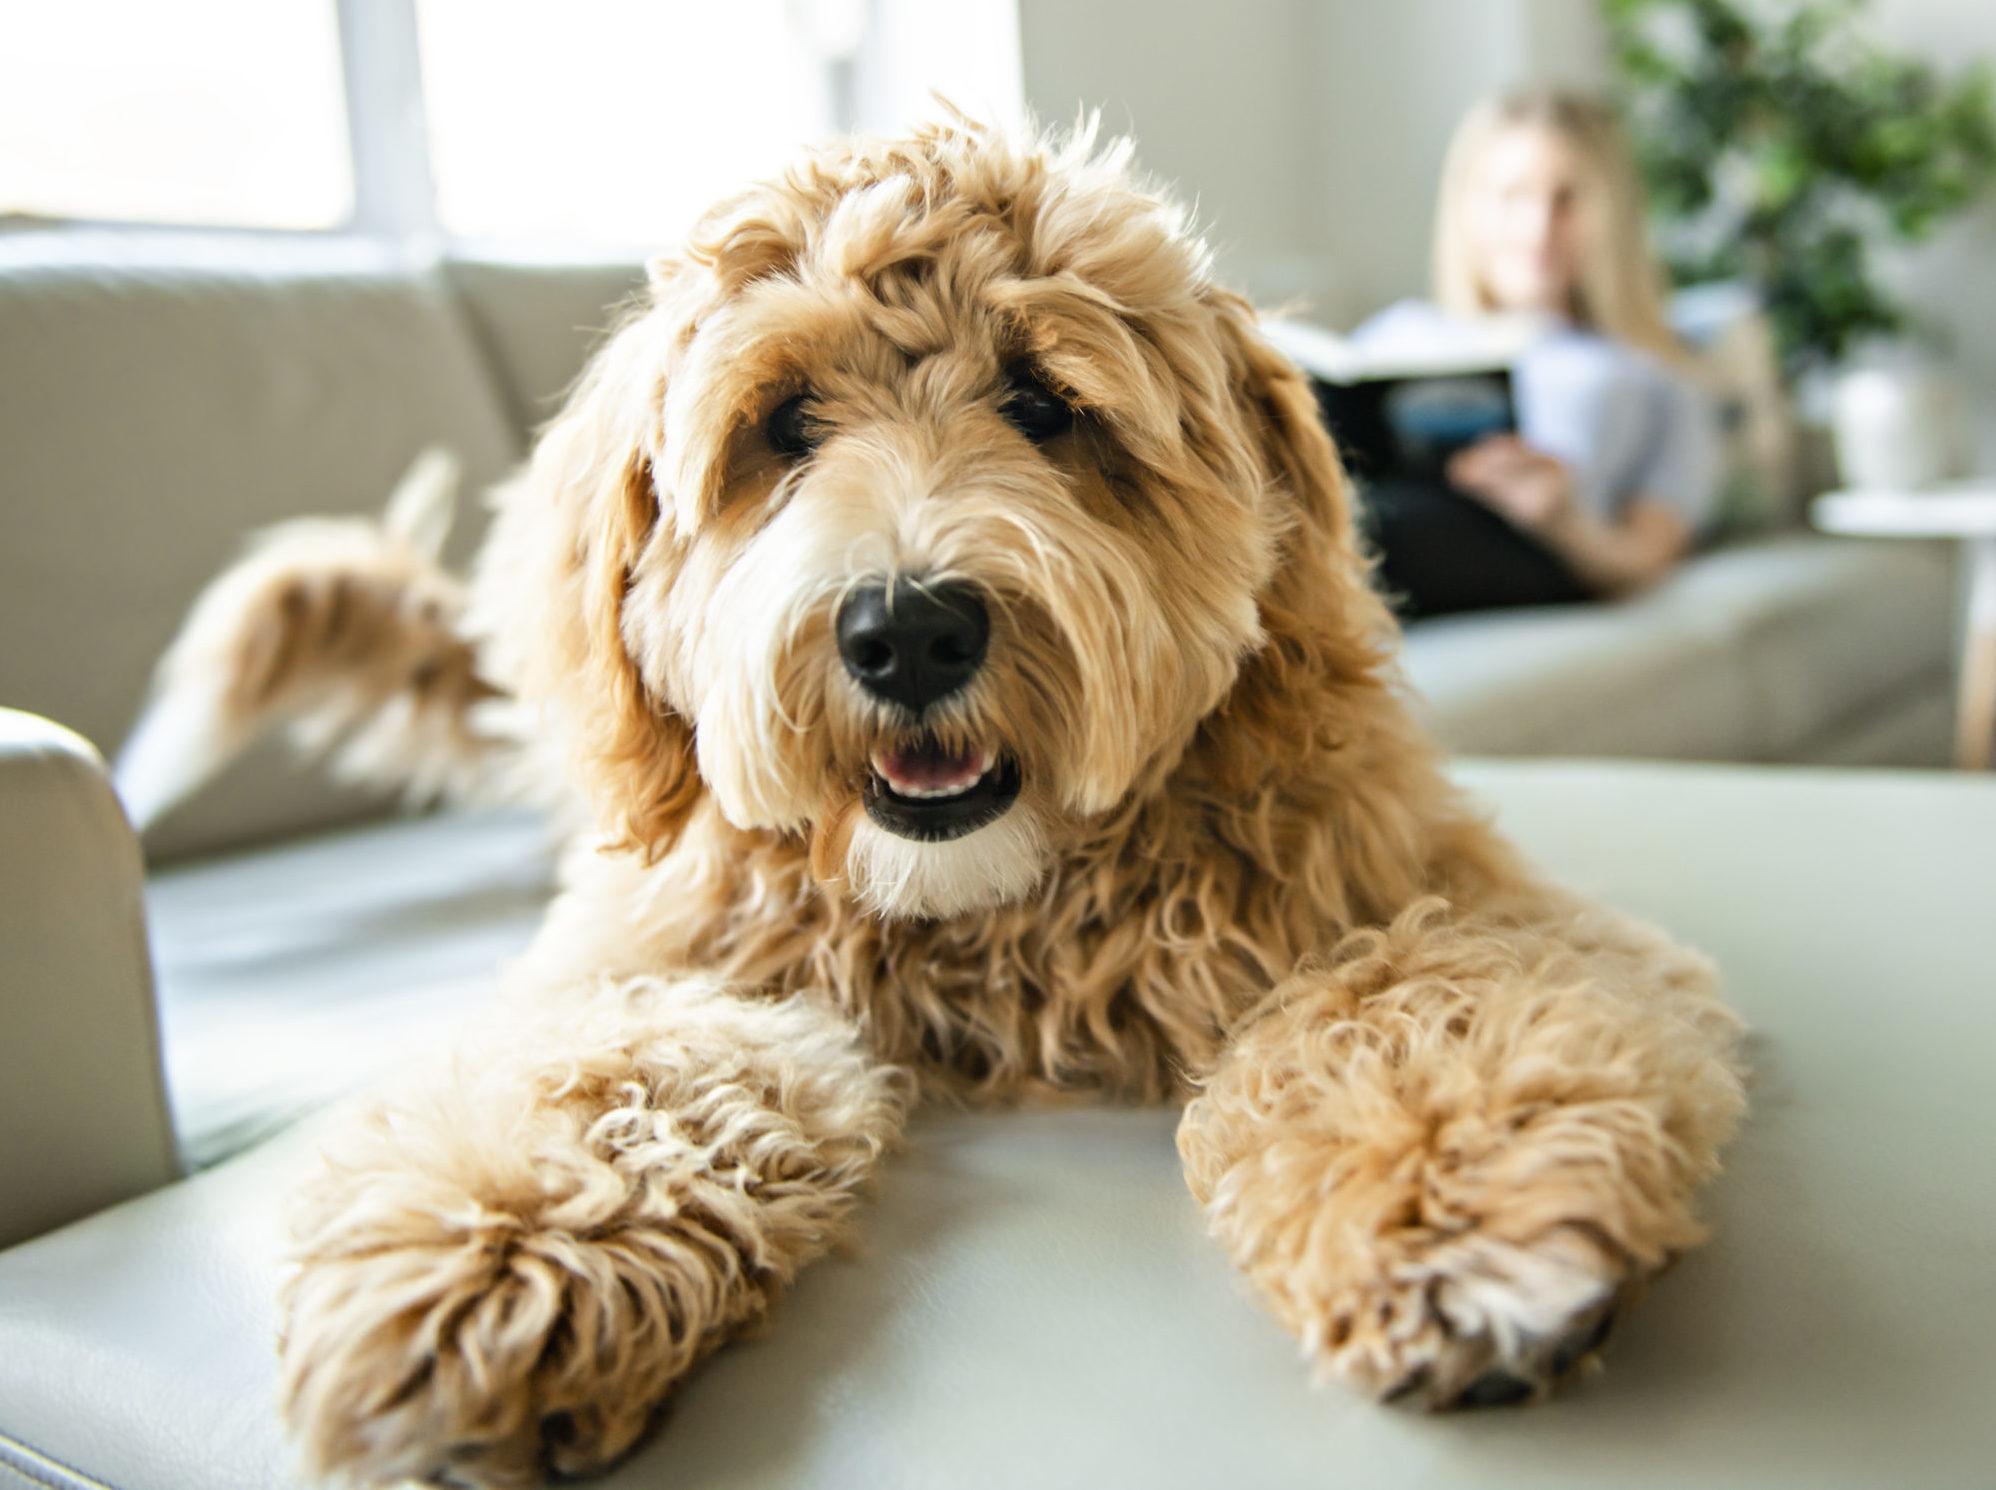 Pet-friendly rentals can attract tenants to a rental property.